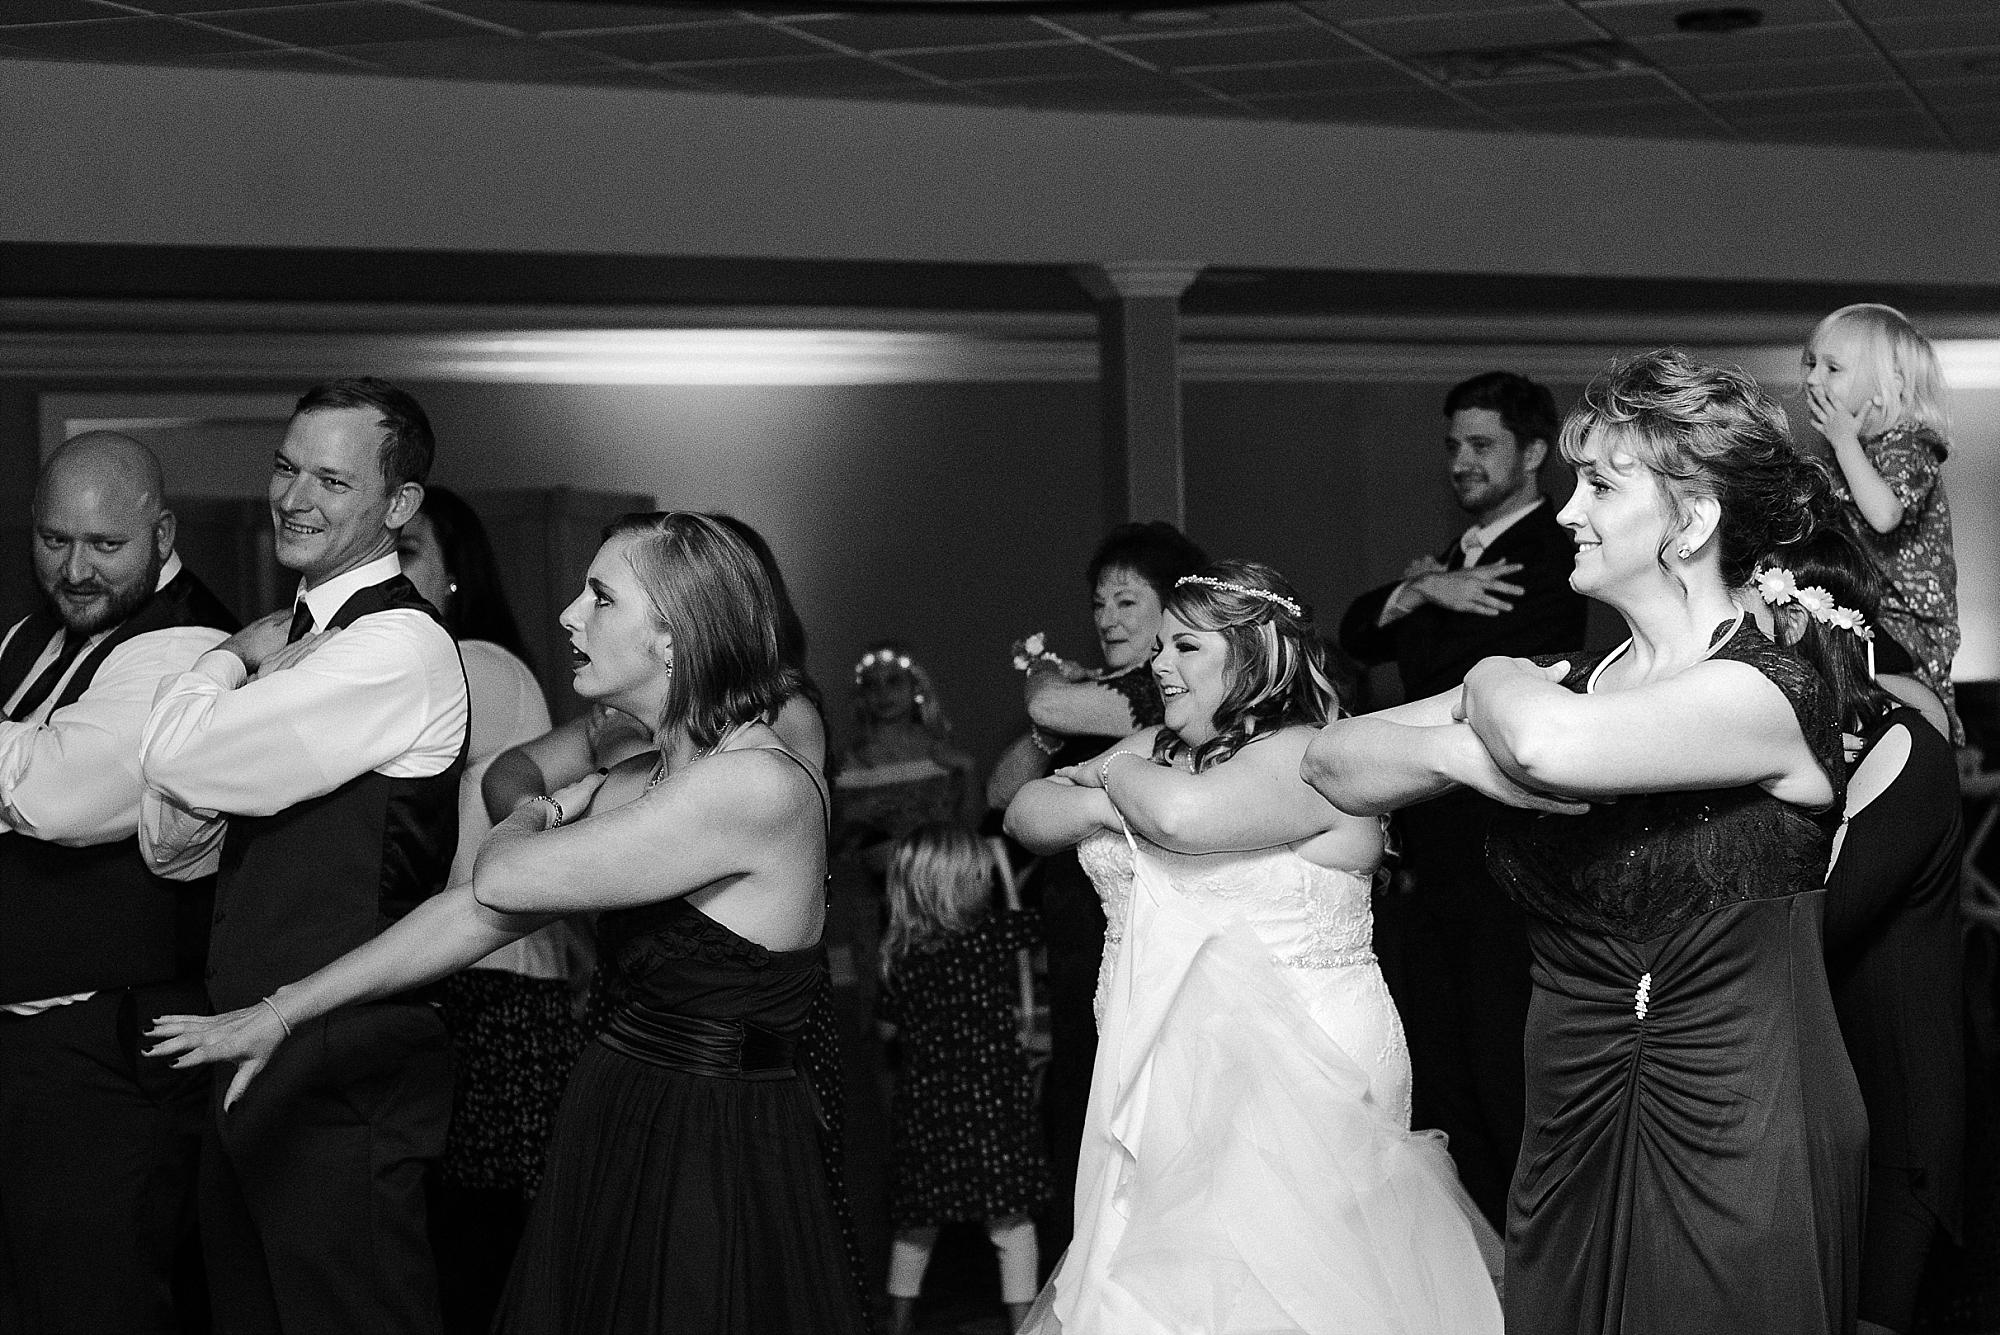 dancing-wedding-reception